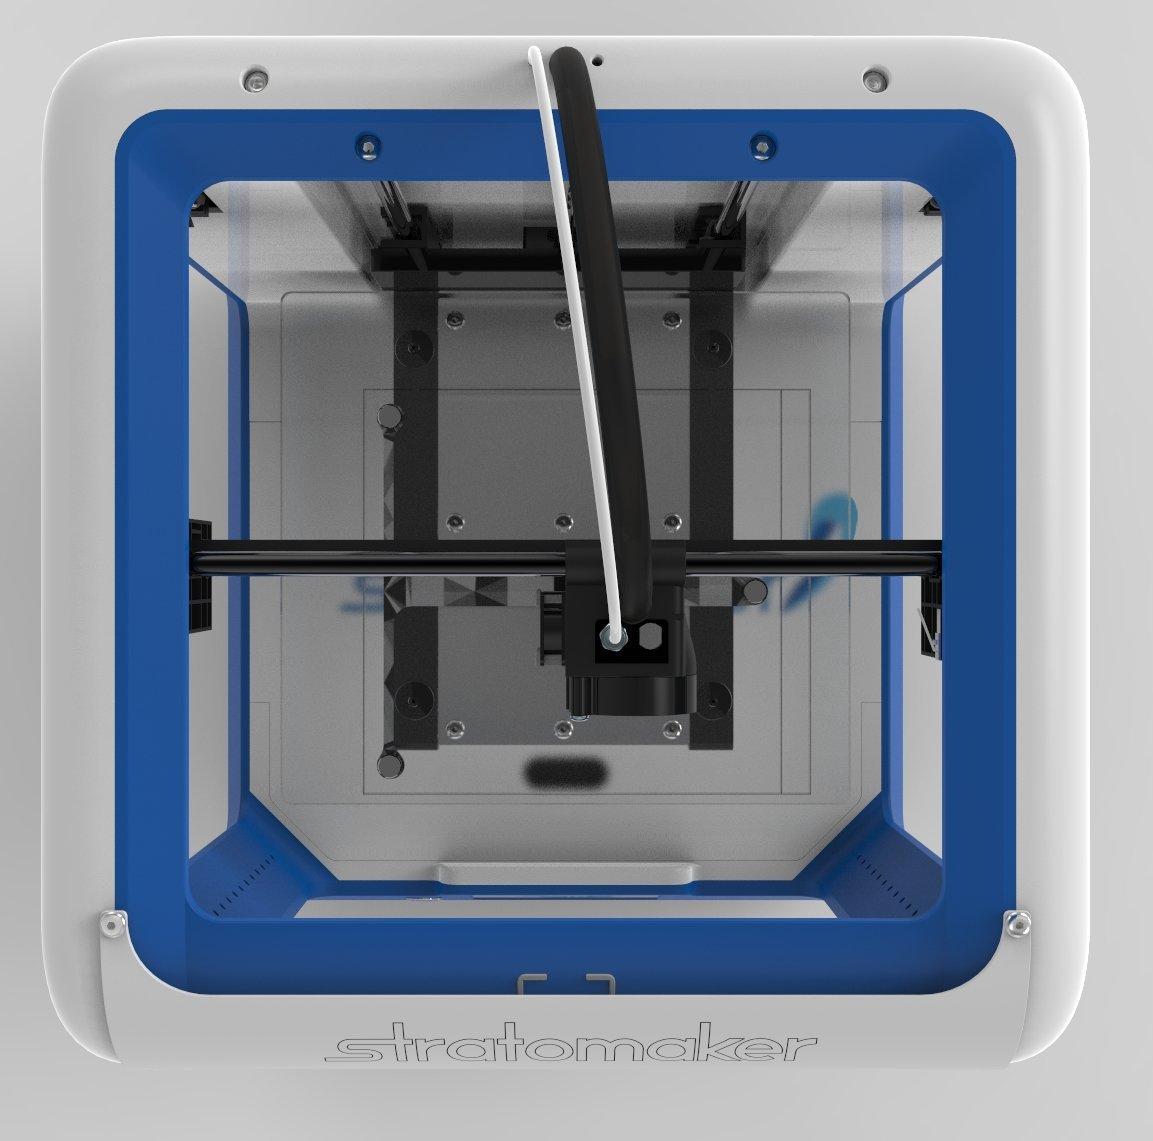 stratomaker Impresora 3D: Amazon.es: Informática